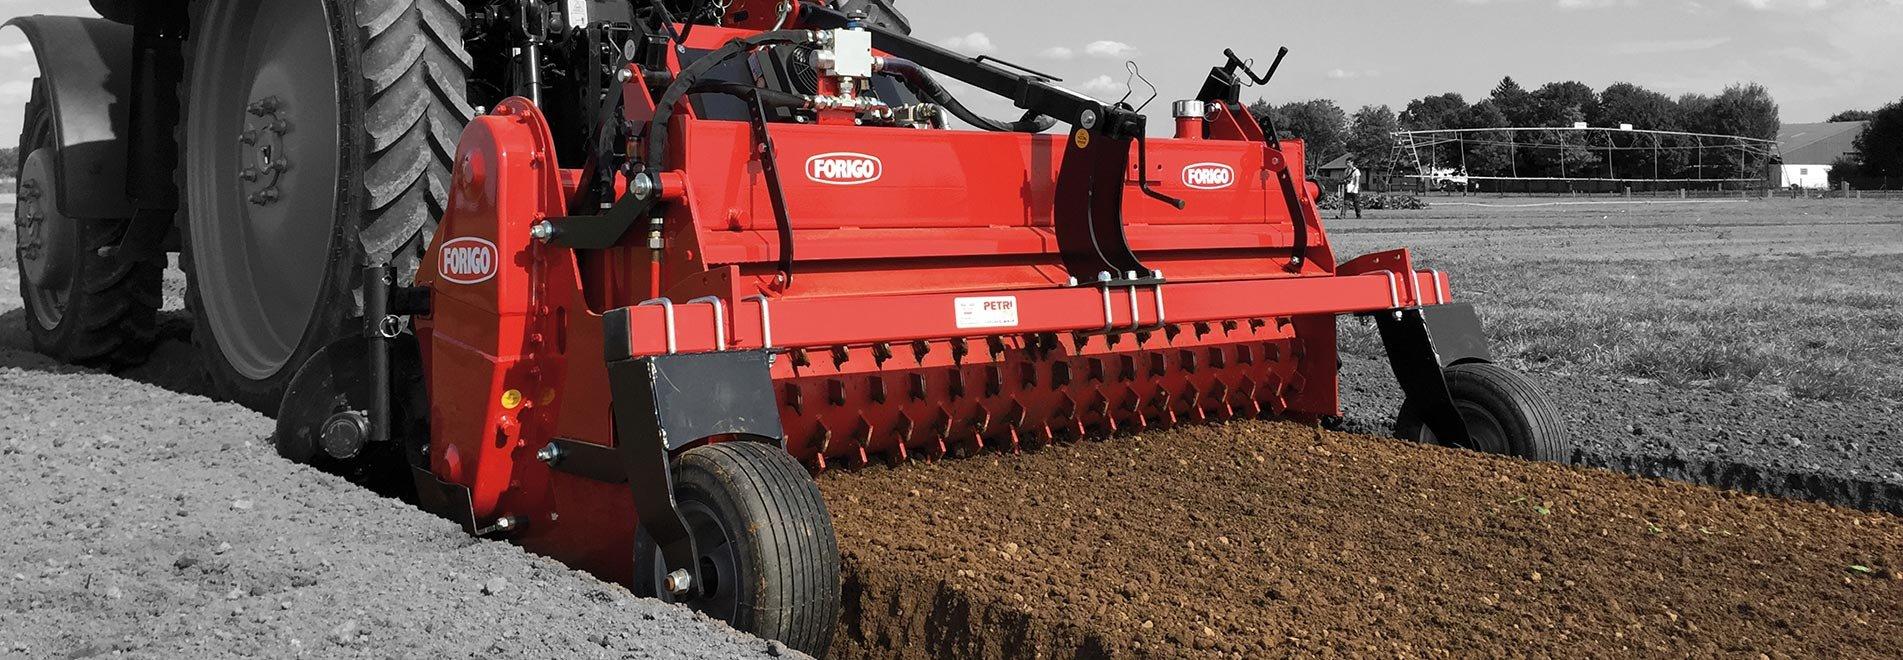 macchine-agricole-01